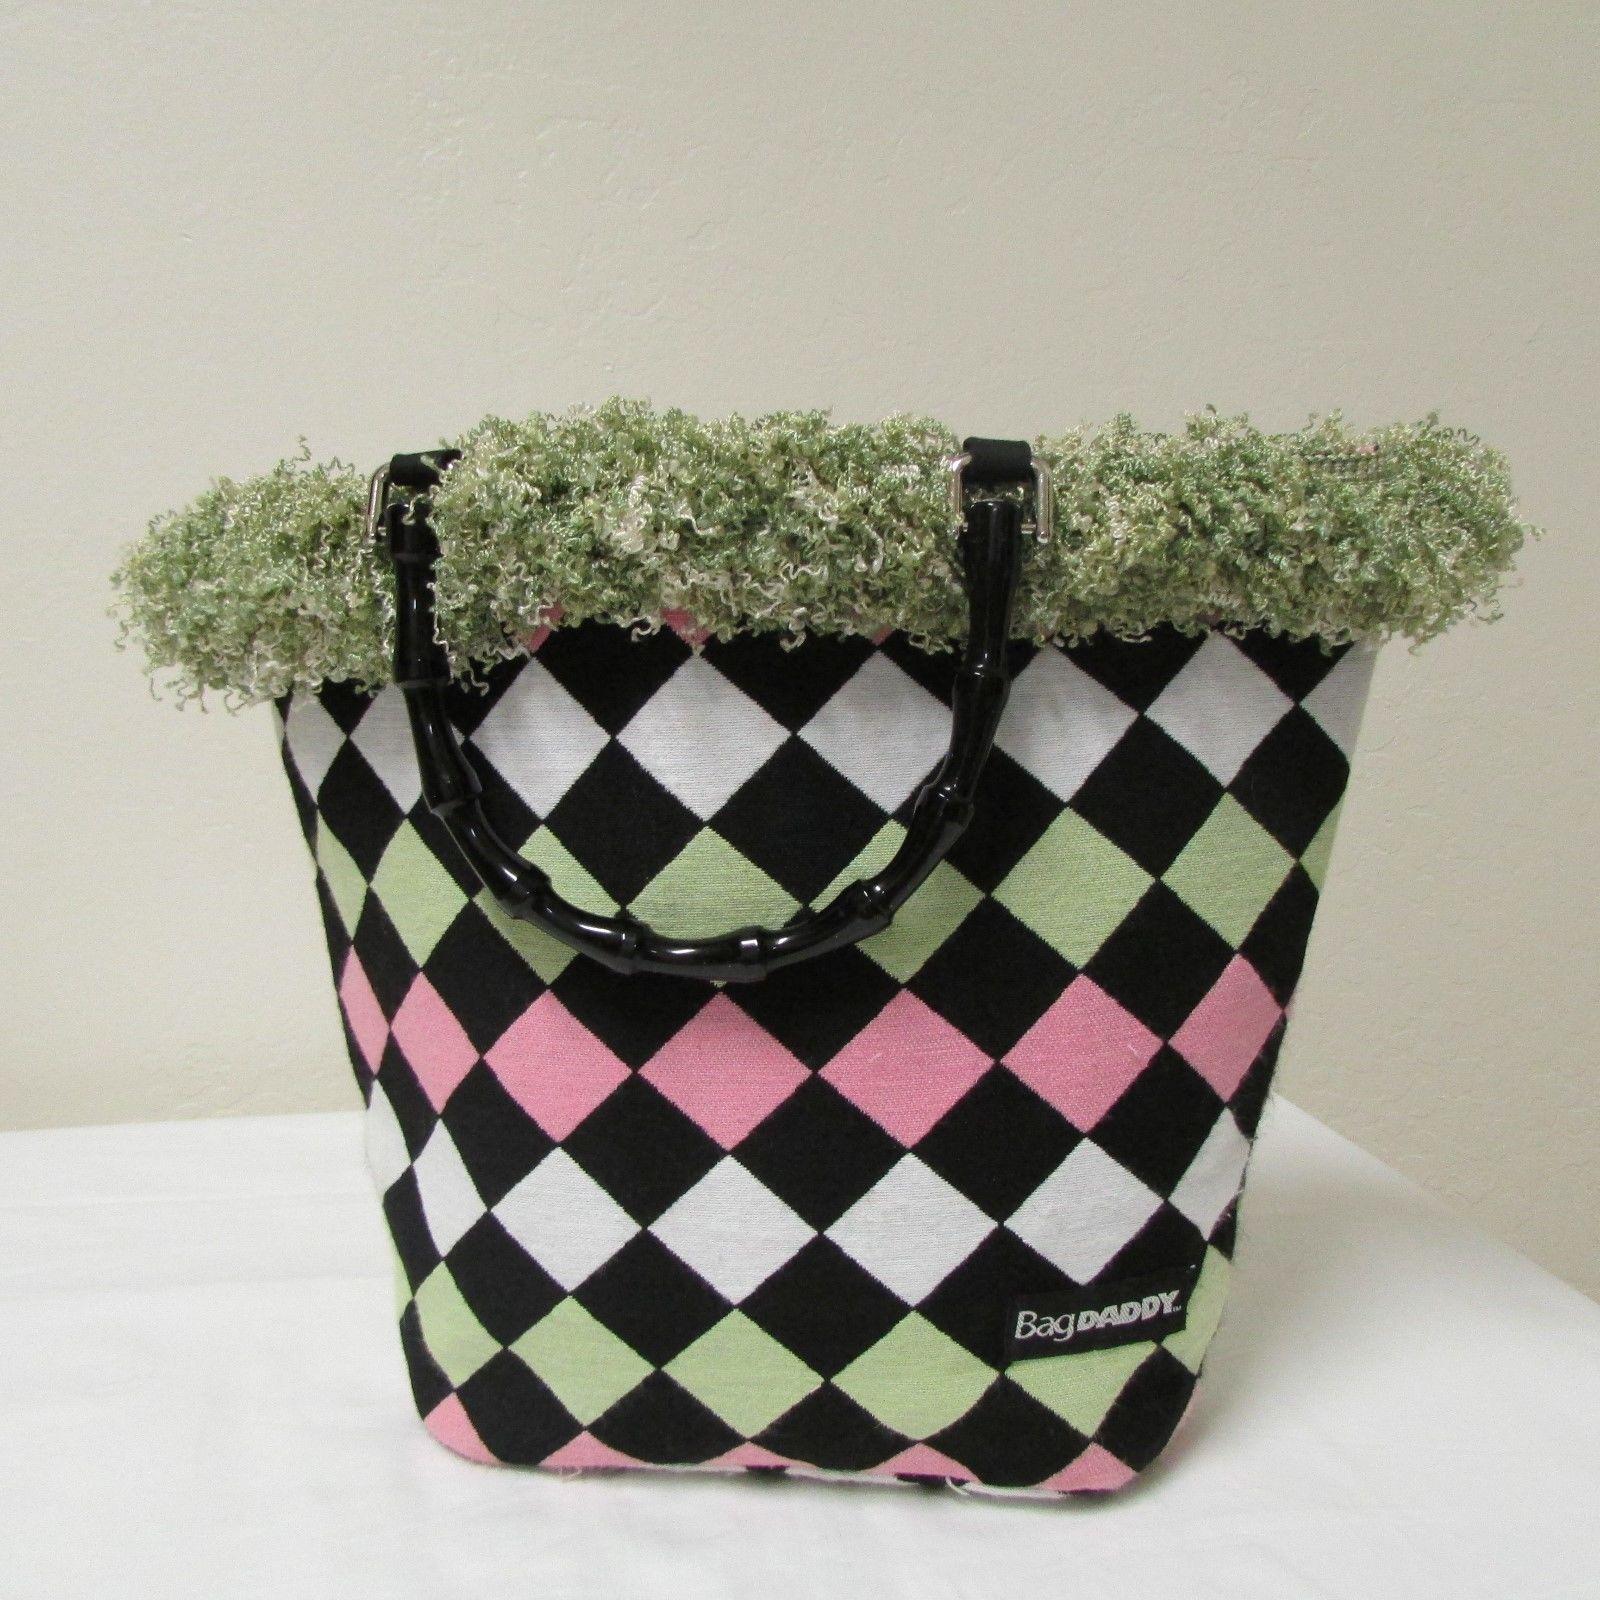 NWOT Bag Daddy Fabric Lime Green Pink Black Handbag Black Bamboo Style Handles image 3